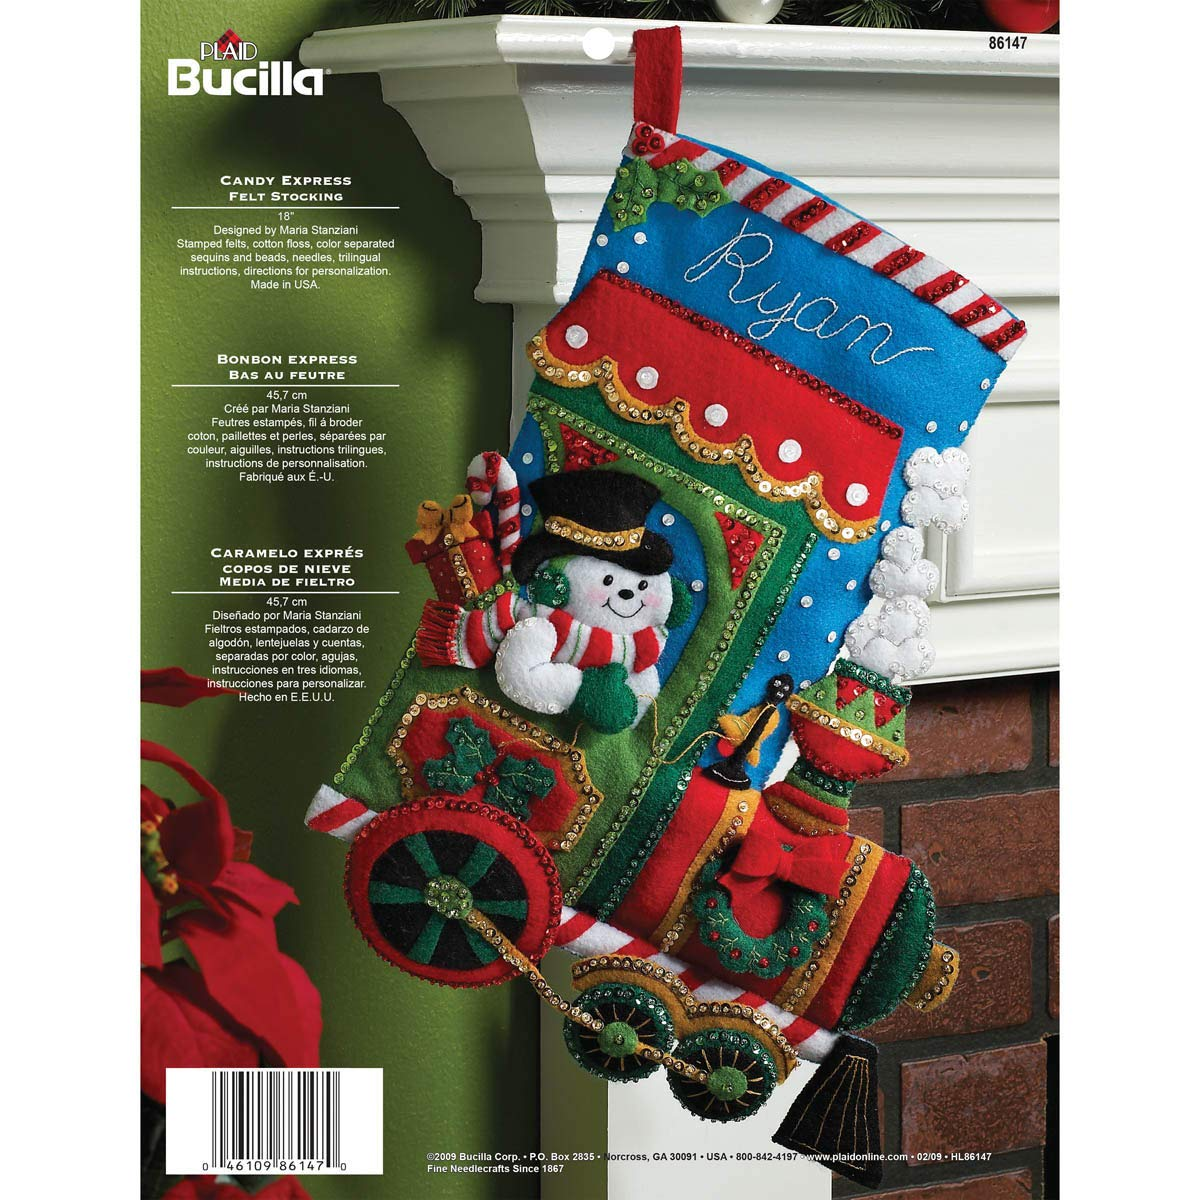 Bucilla Christmas Stocking Kits.Bucilla 18 Inch Christmas Stocking Felt Applique Kit 86147 Candy Express